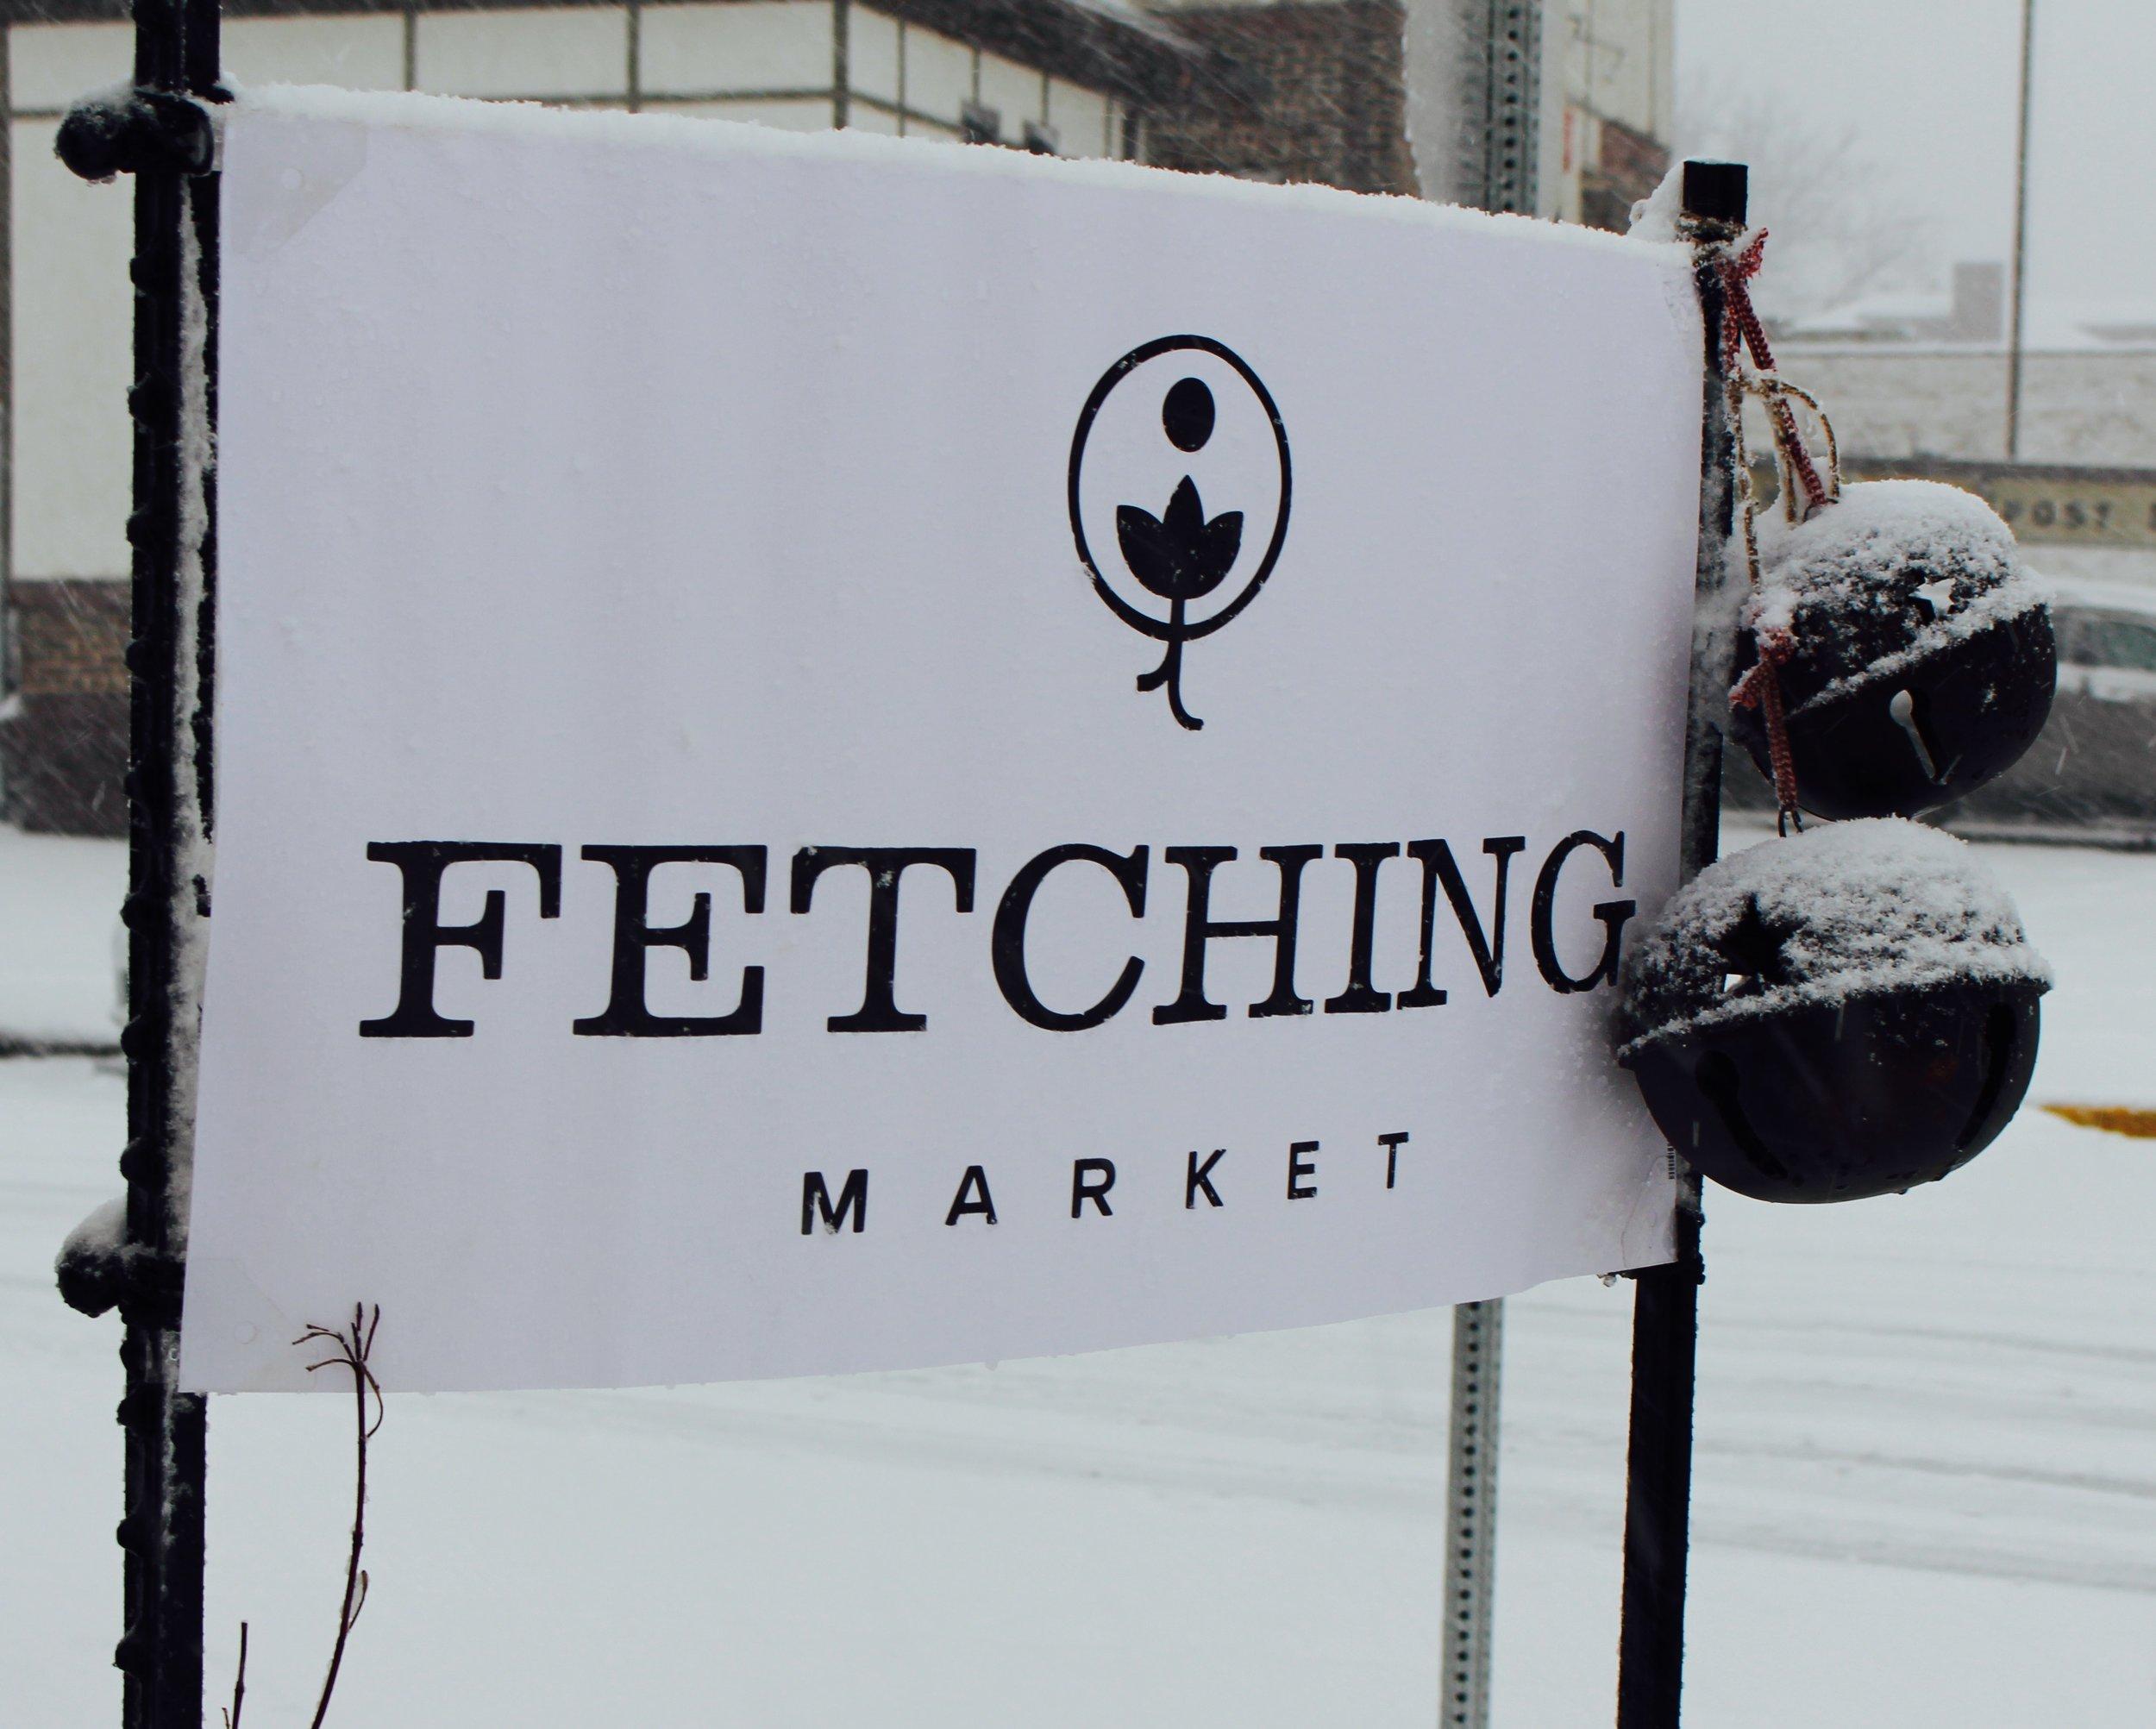 Fetching Market Nov 15.jpg